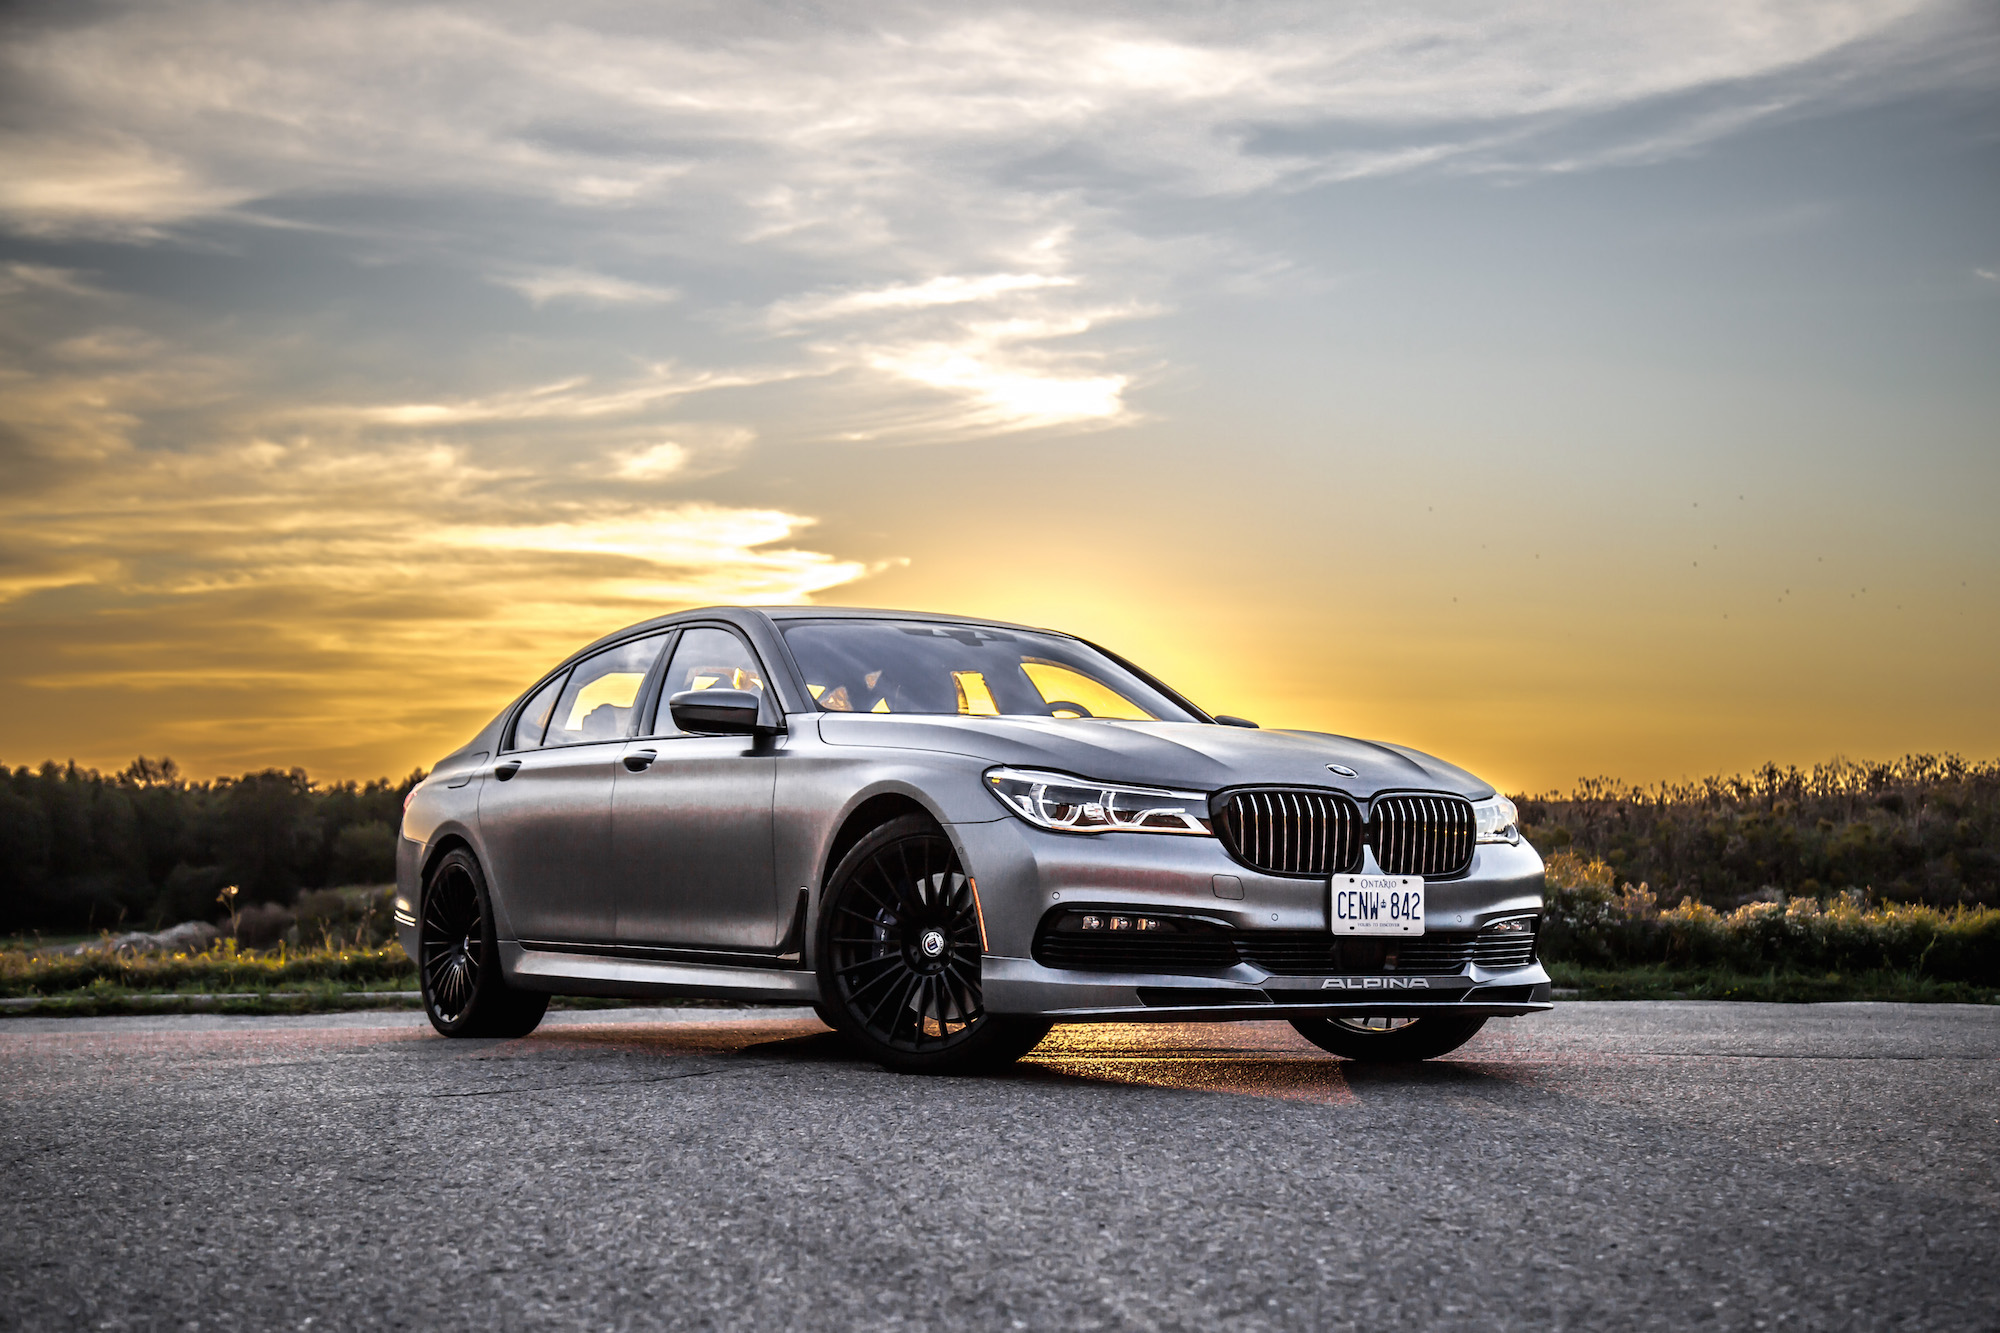 Bmw Alpina B6 >> Review: 2019 BMW Alpina B7 Exclusive Edition | CAR